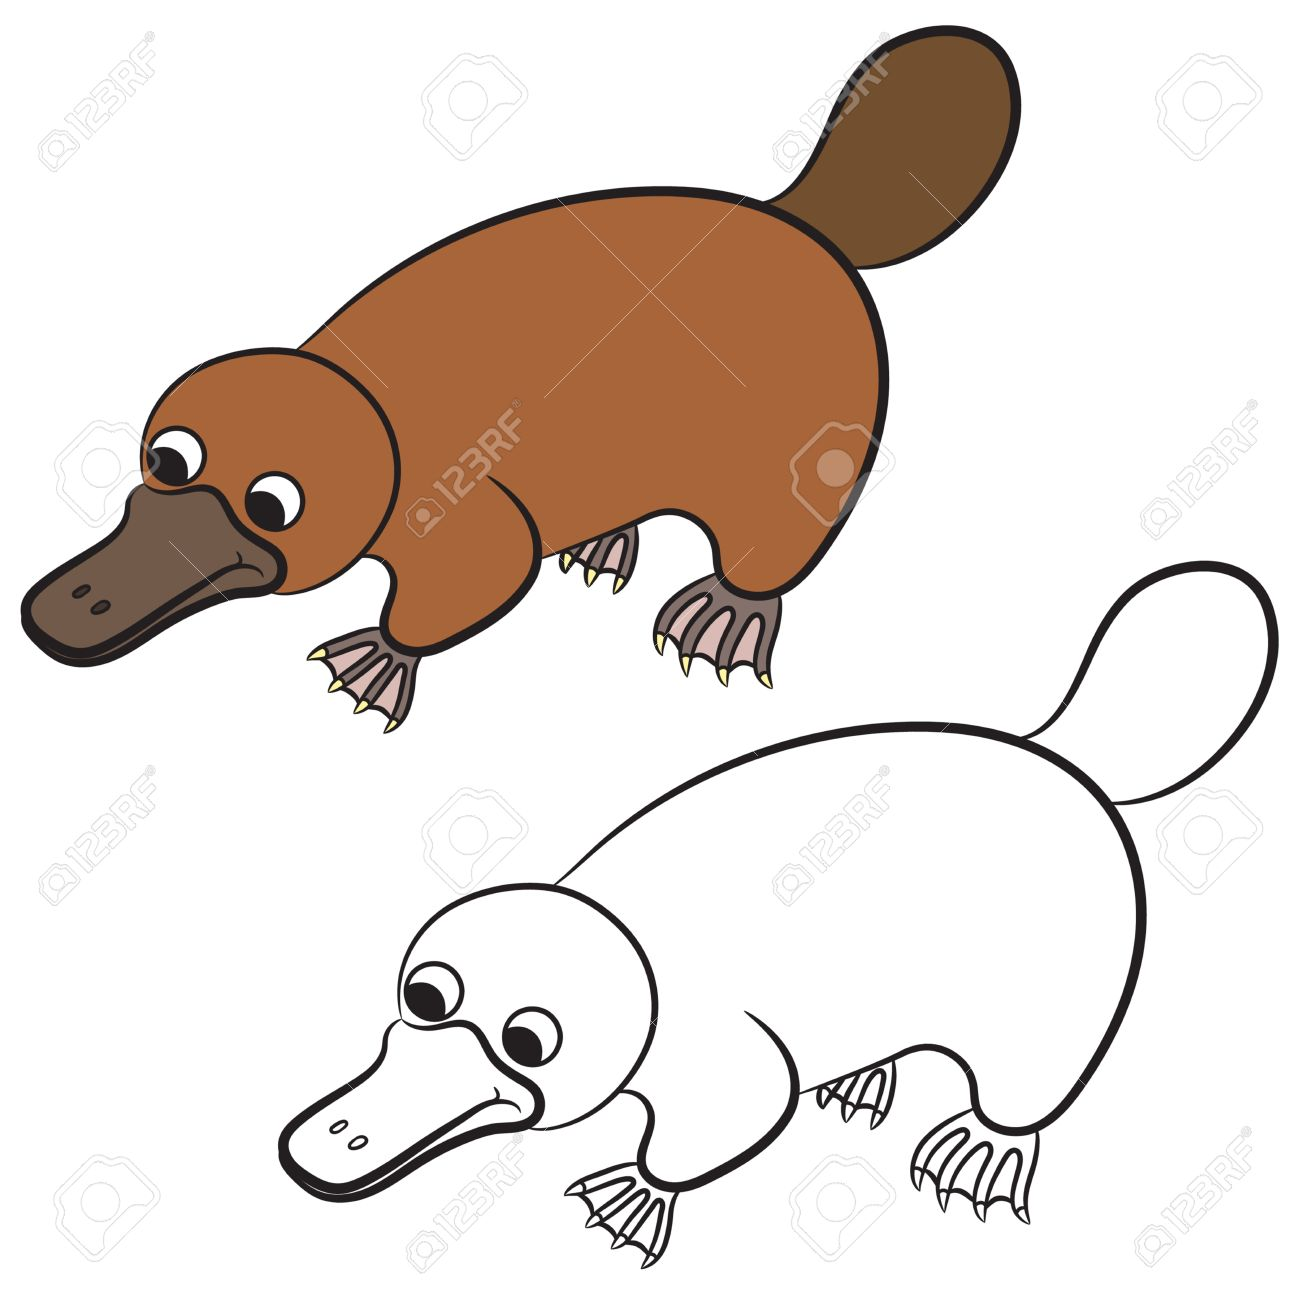 Ilustración De Dibujos Animados De Ornitorrinco O Animal Pico De ...